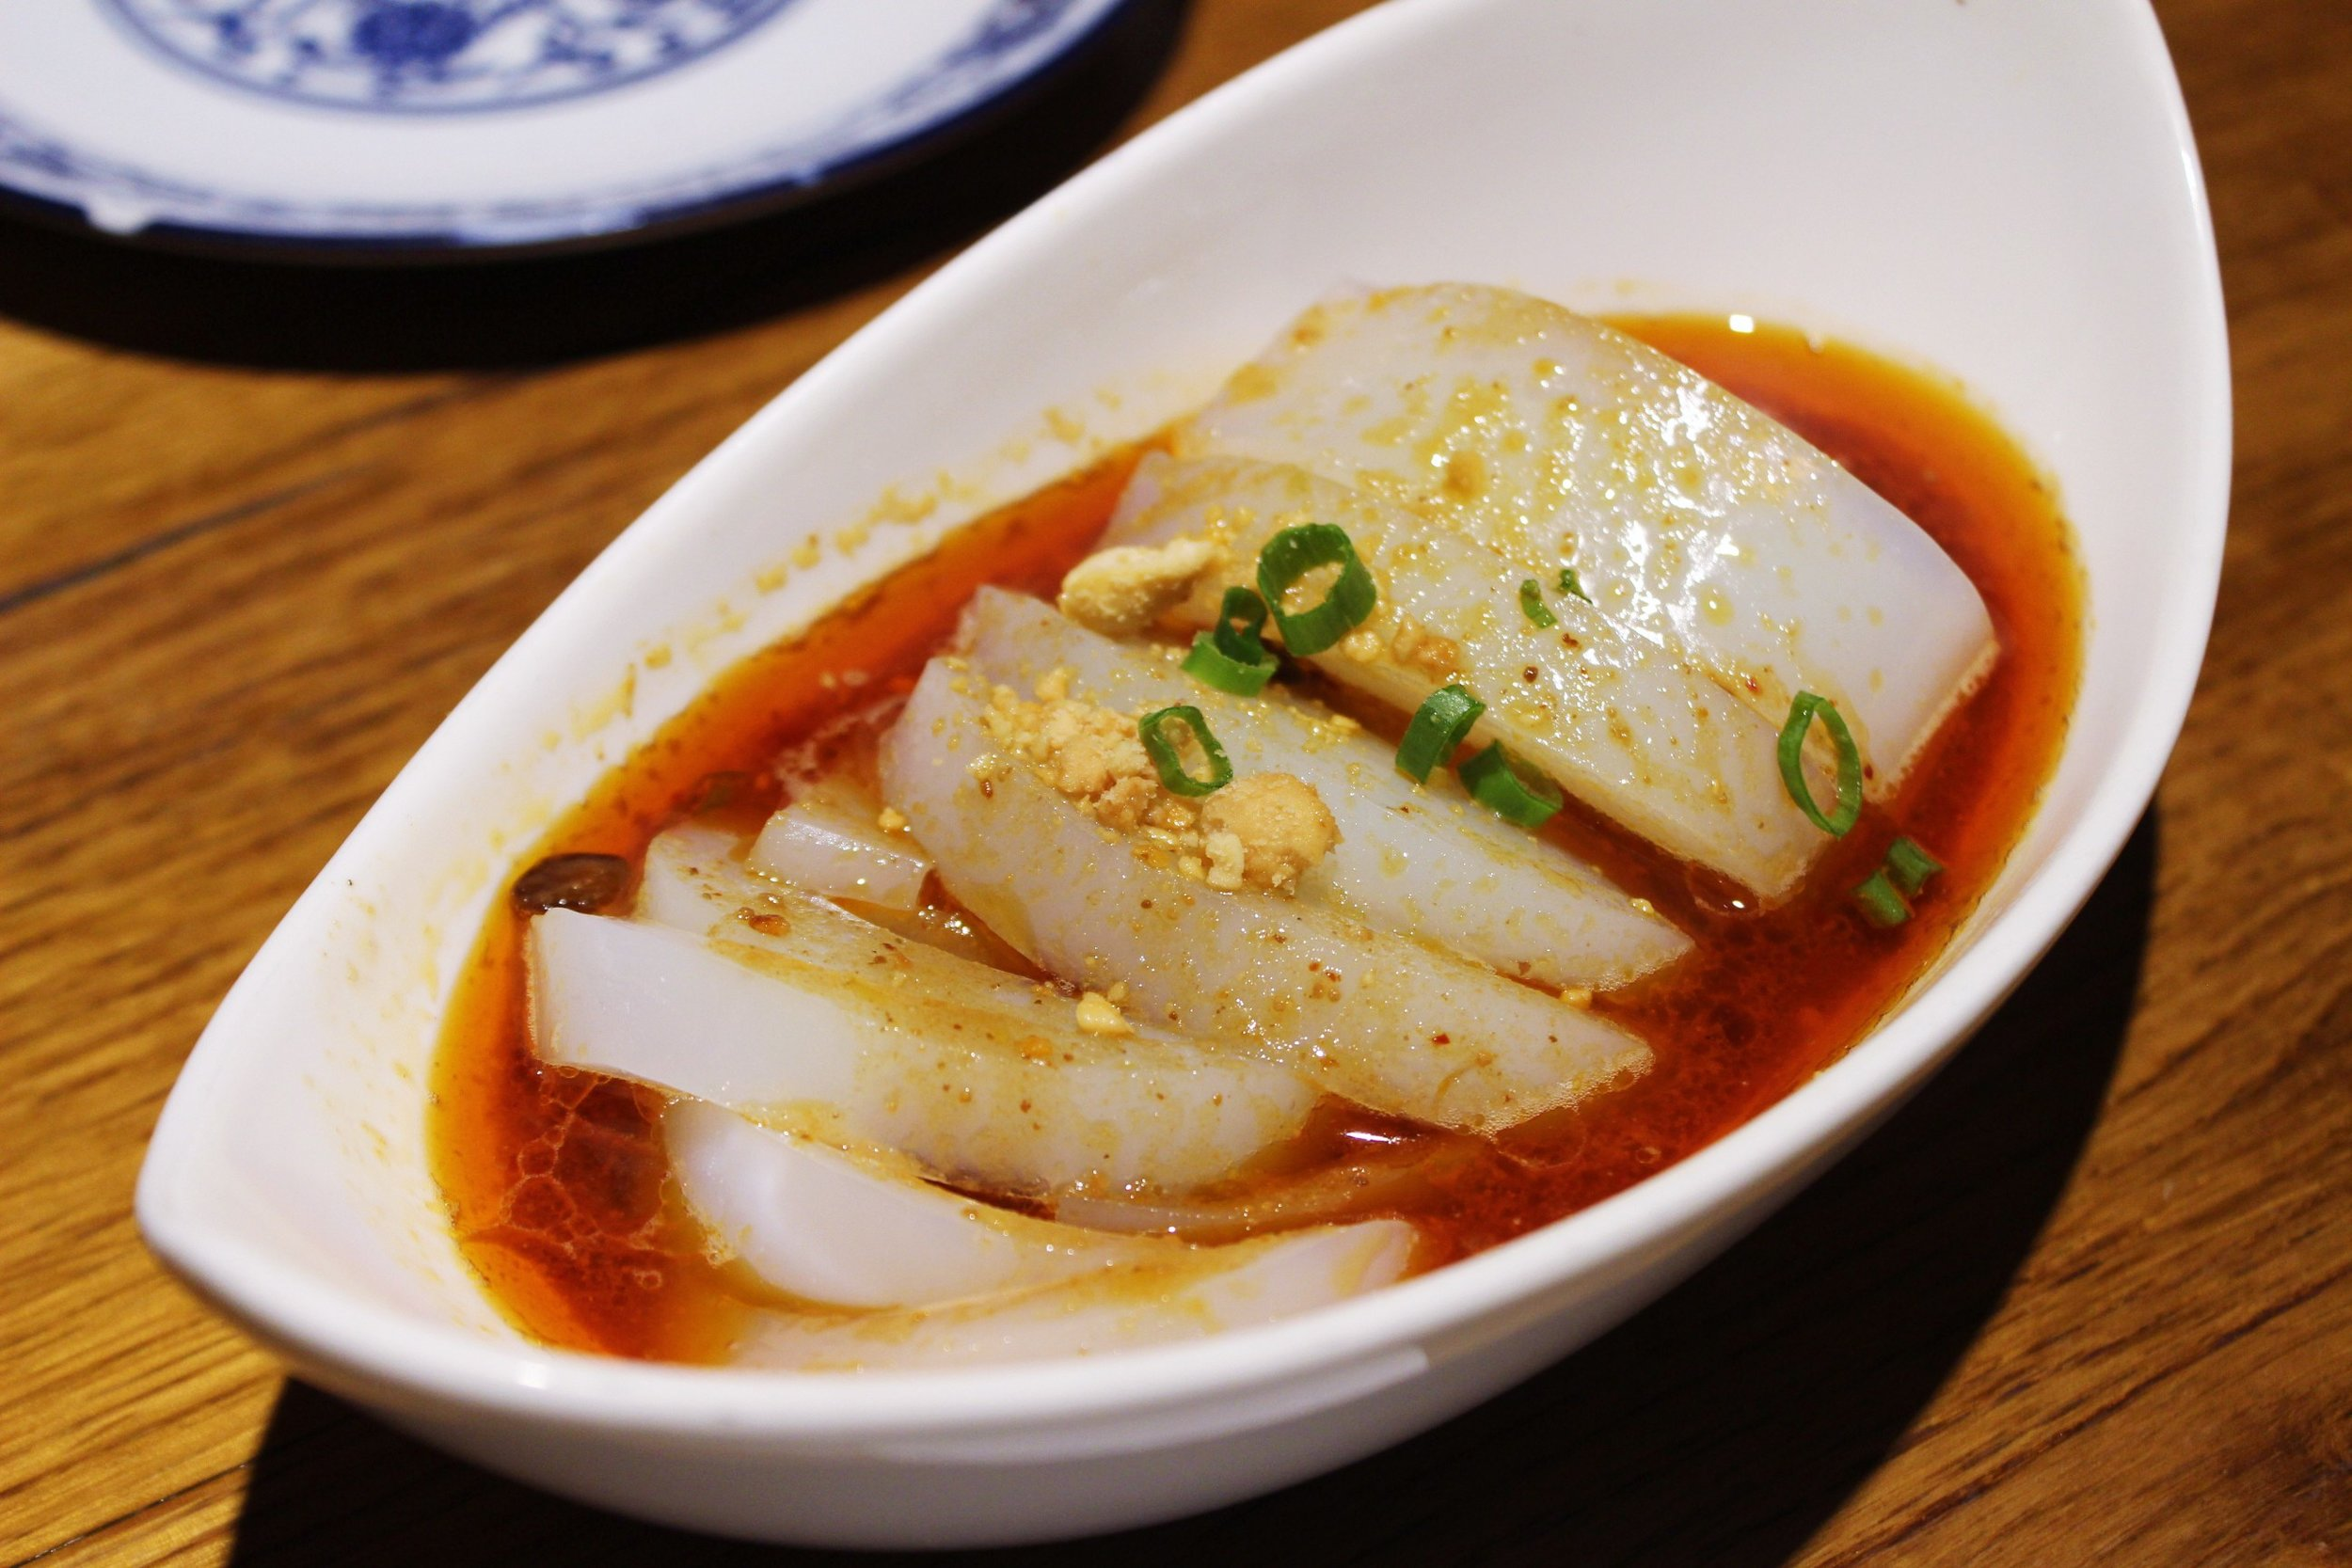 Spicy Mung Bean Jello Salad at Szechuan Mountain House